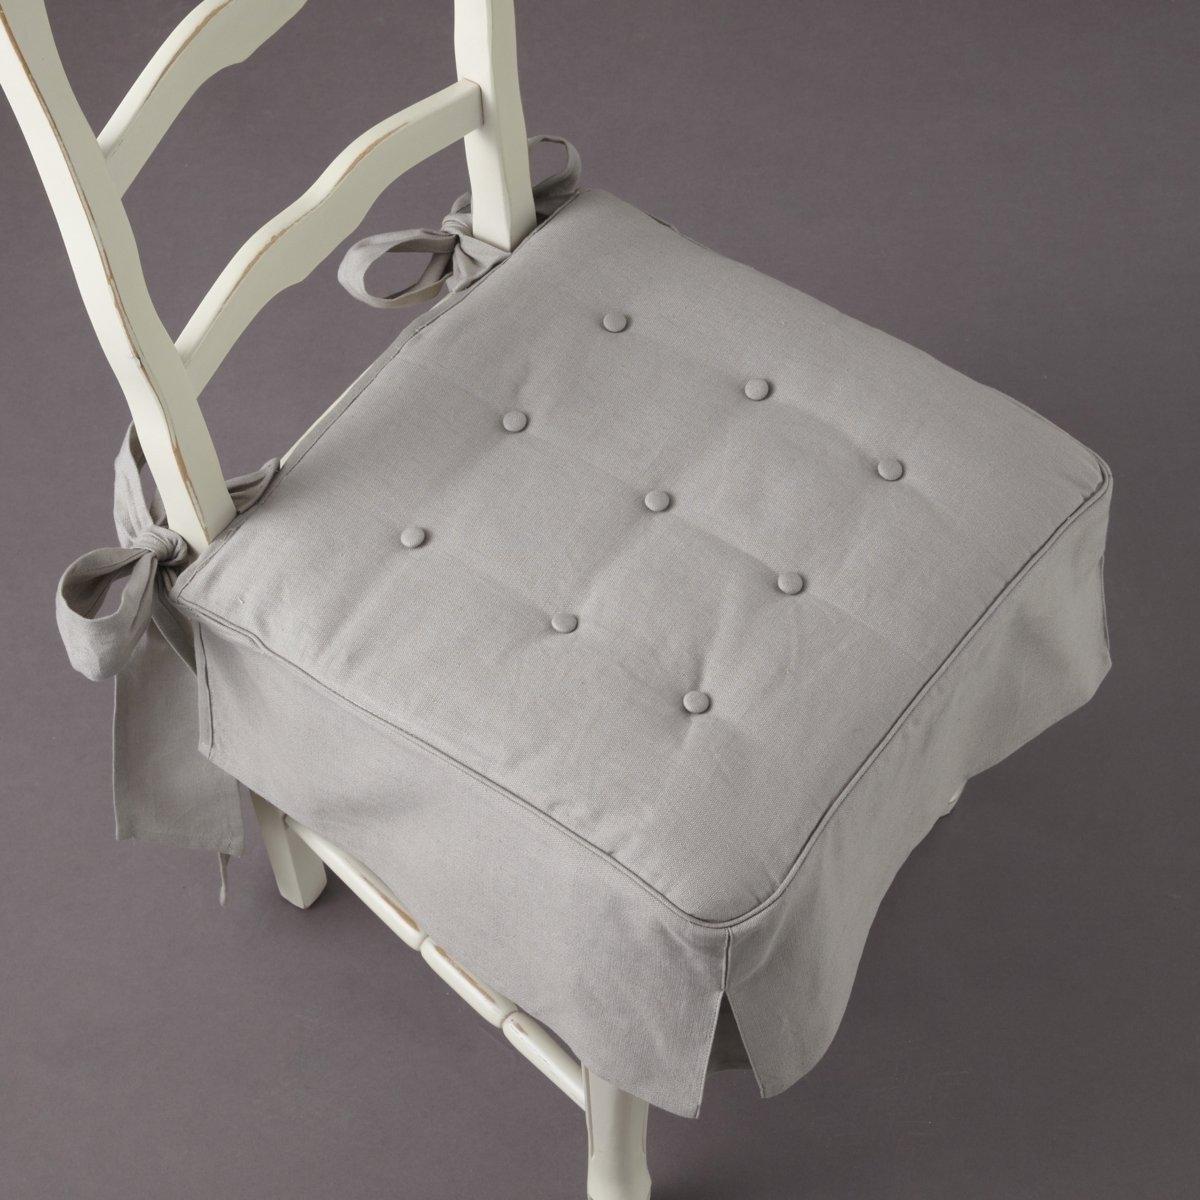 Подушка на стул из льна и хлопка, Jimi подушка на стул арти м райский сад